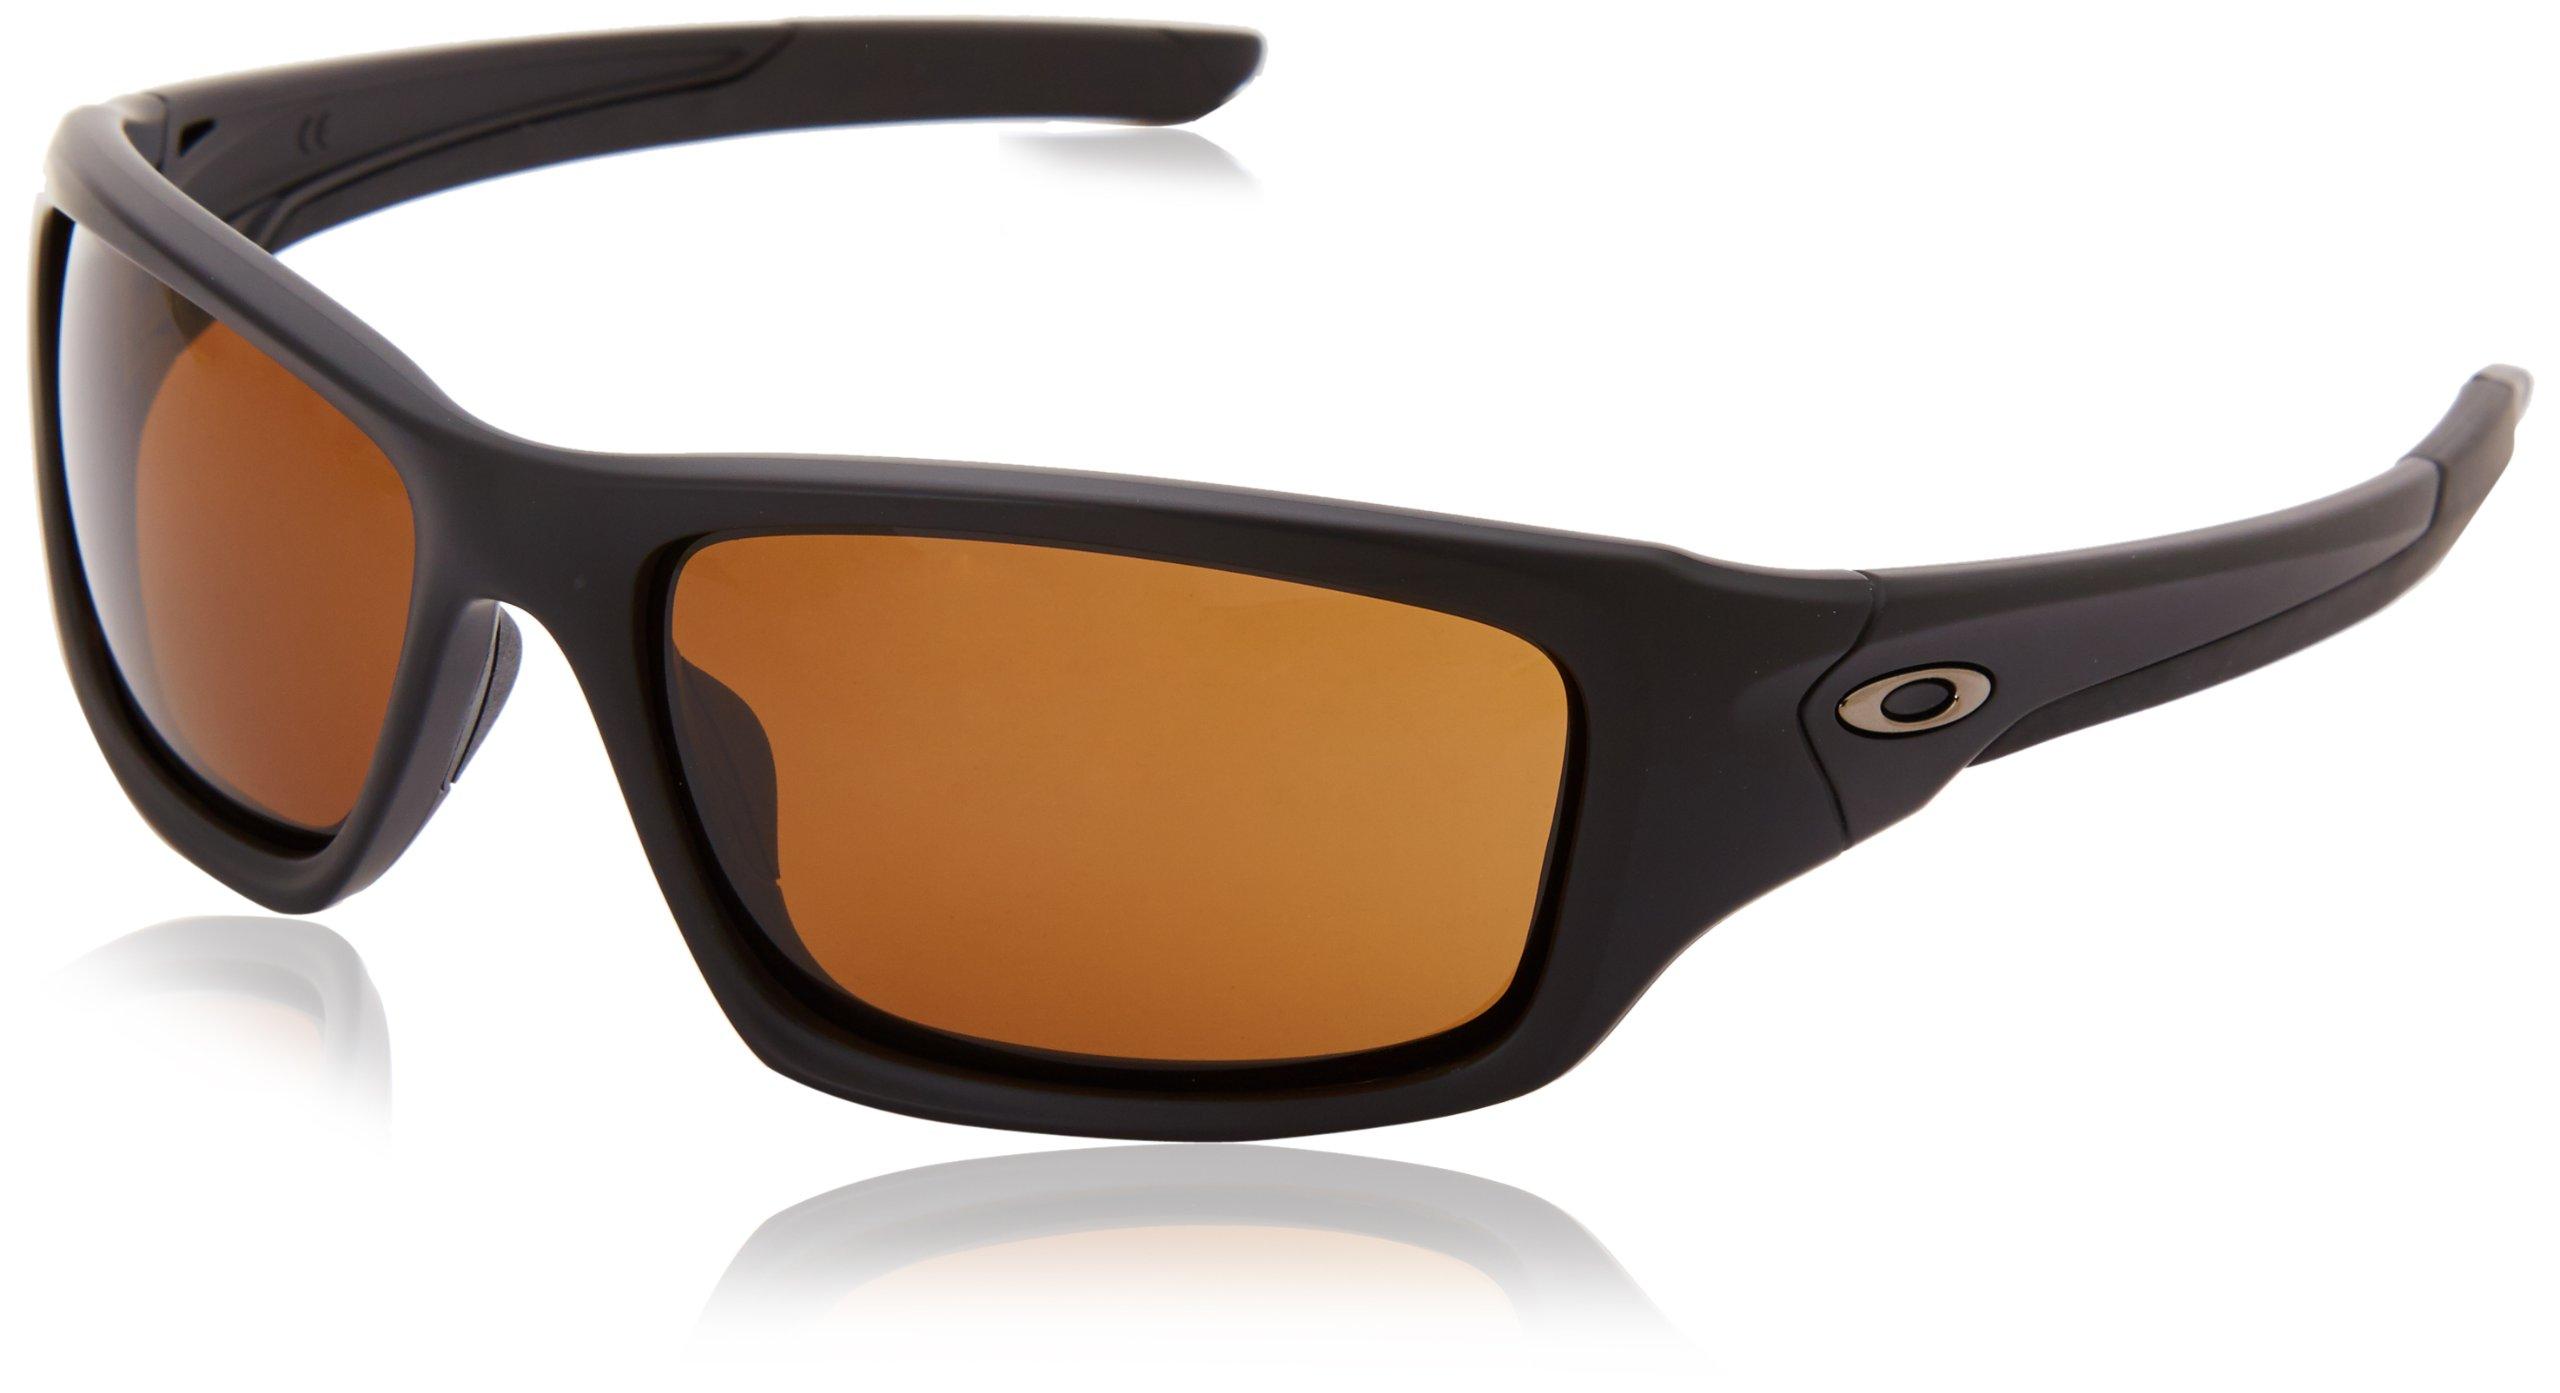 OAKLEY Valve OO9236-03 Rectangular Sunglasses,Matte Black/Orange 60mm